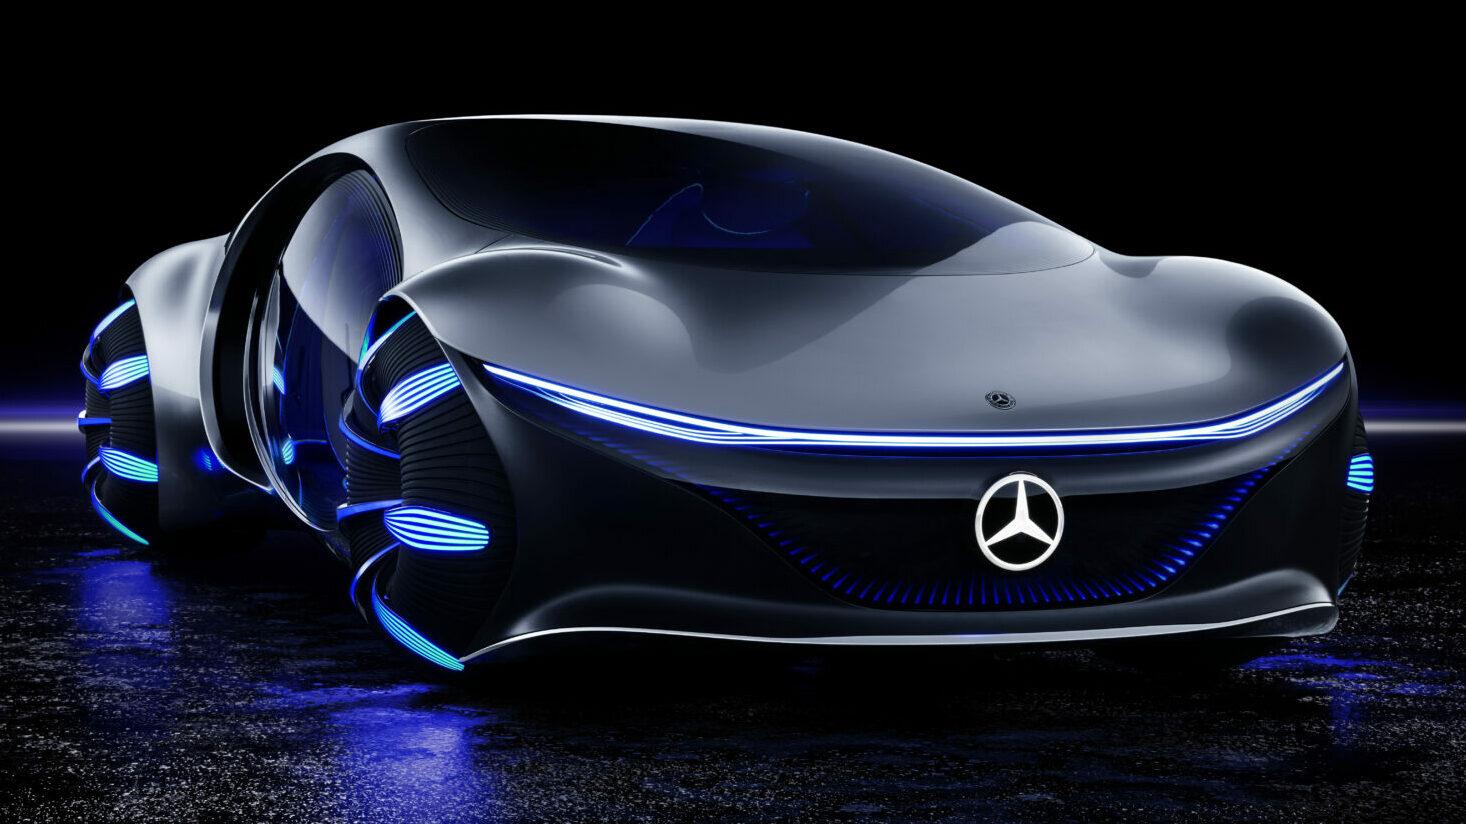 Mercedes-Benz Vision AVTR frontal